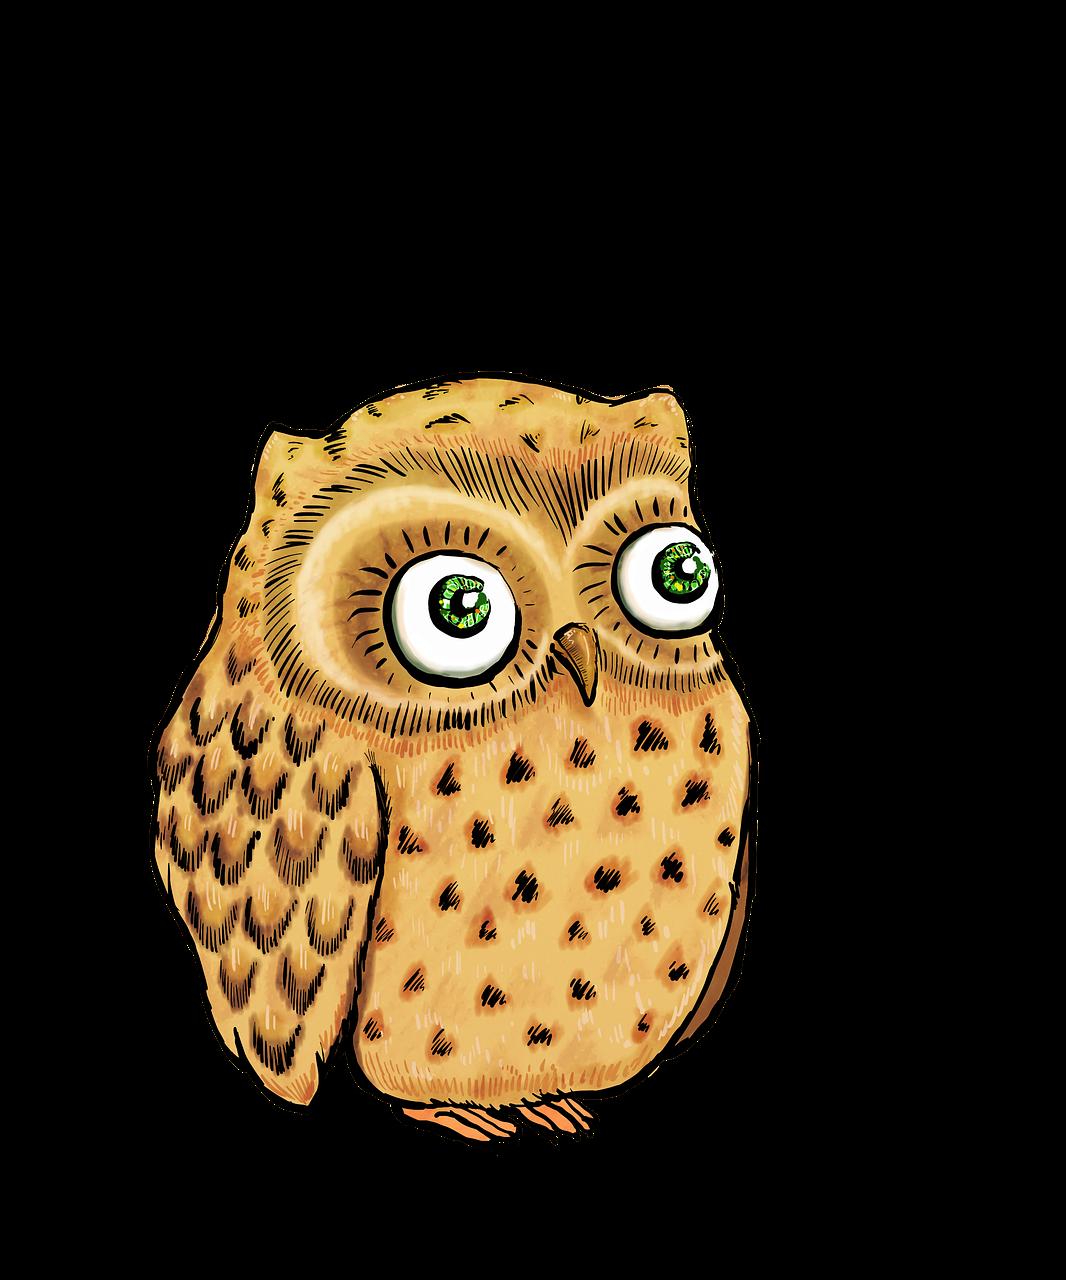 1066x1280 owl, cute owl, owl illustration, owl drawing, bird